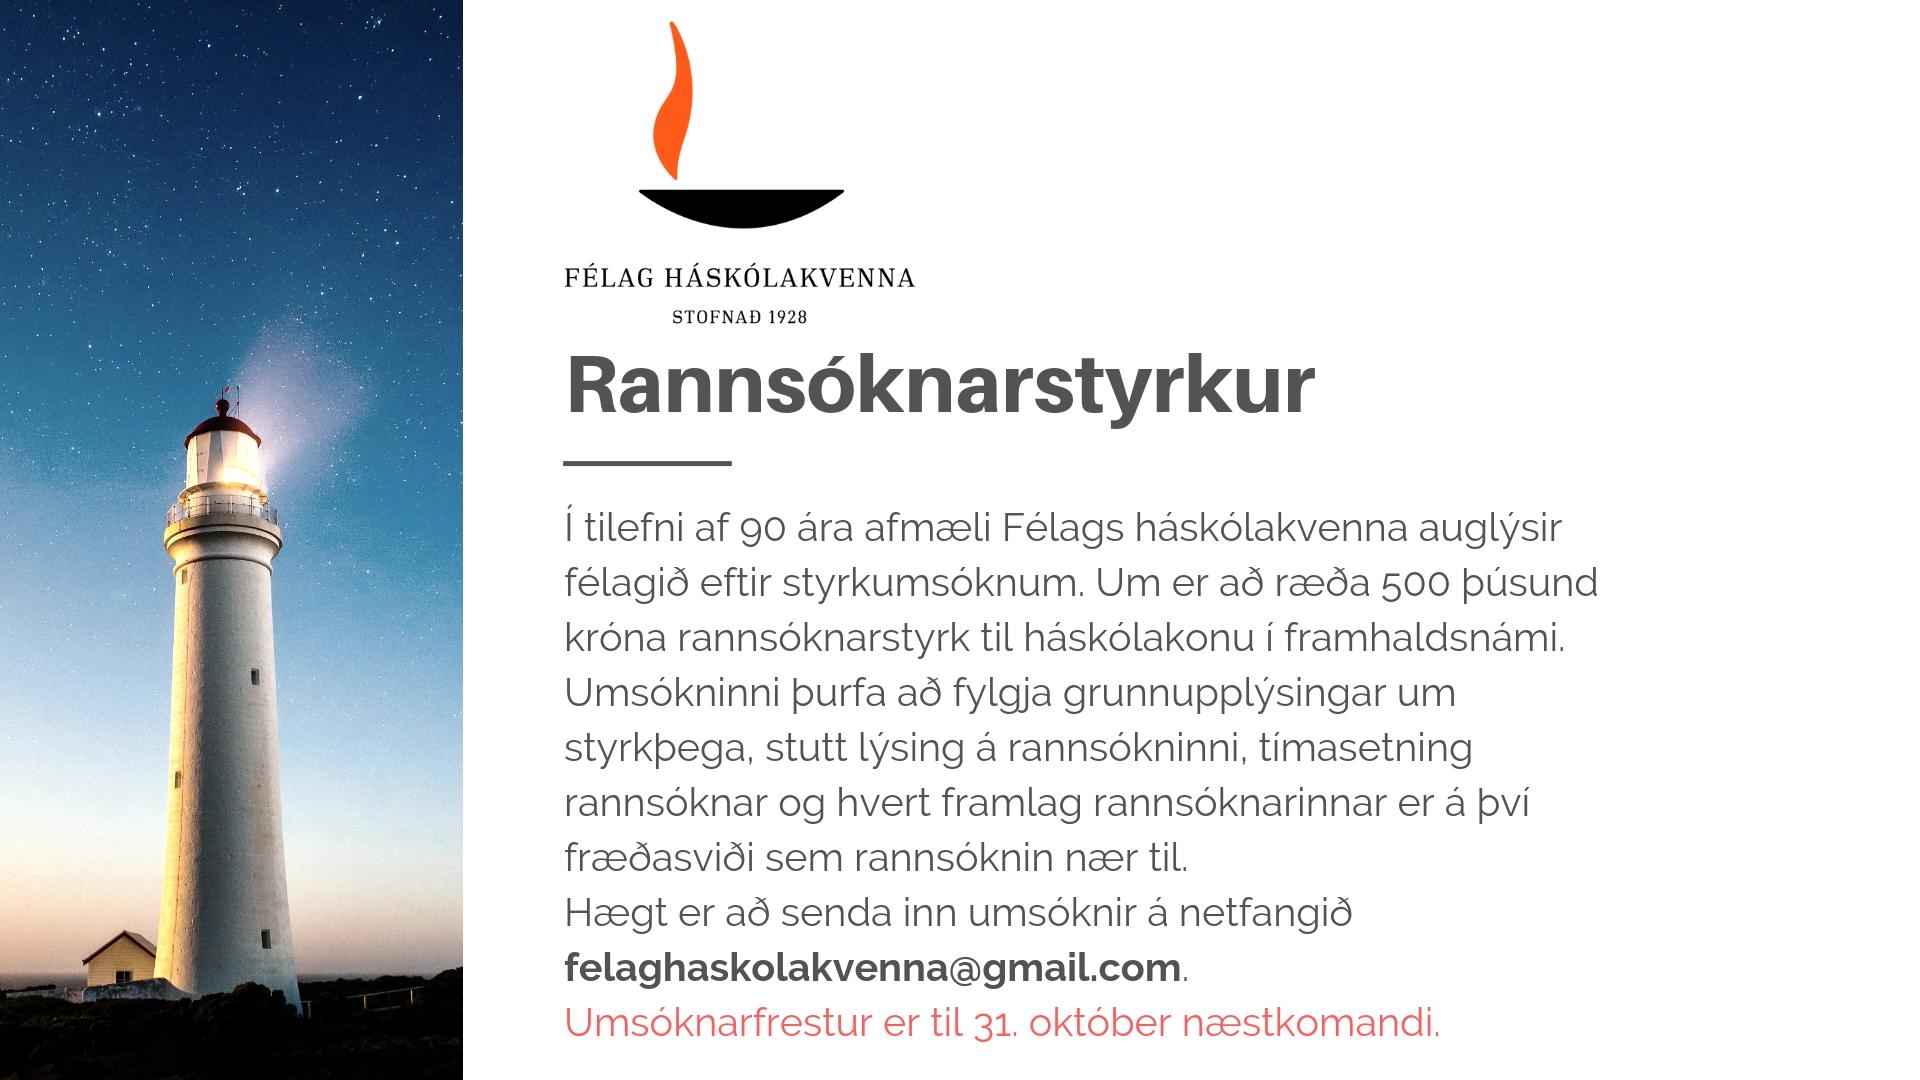 FHK Rannsóknarstyrkur 2018.jpg